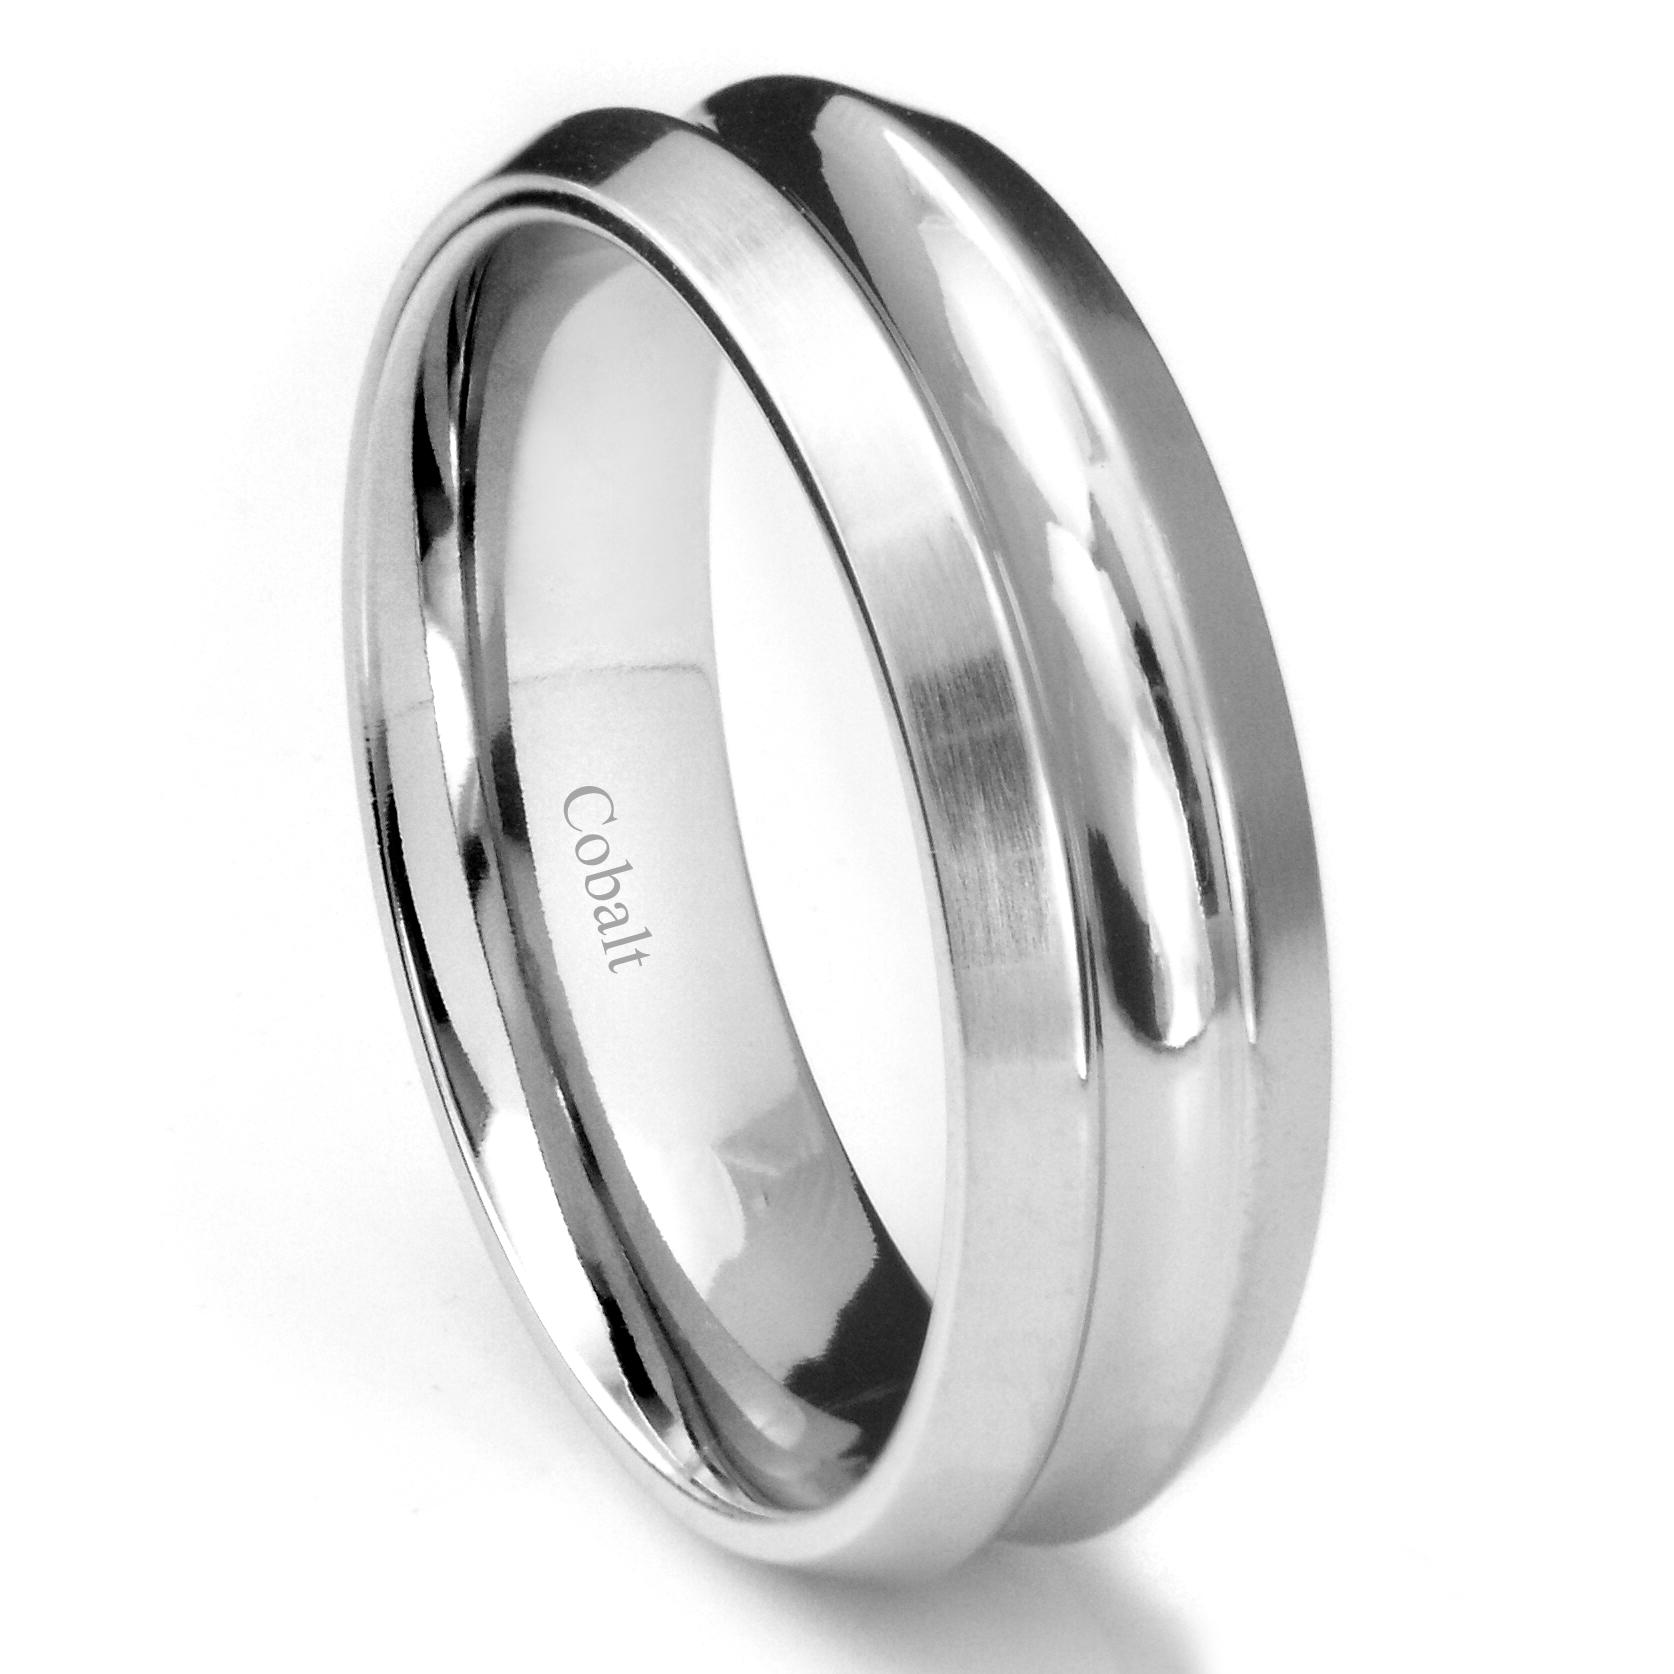 Cobalt XF Chrome 8MM Concave Wedding Band Ring w Beveled Edges P cobalt wedding rings Home Cobalt Rings Loading zoom